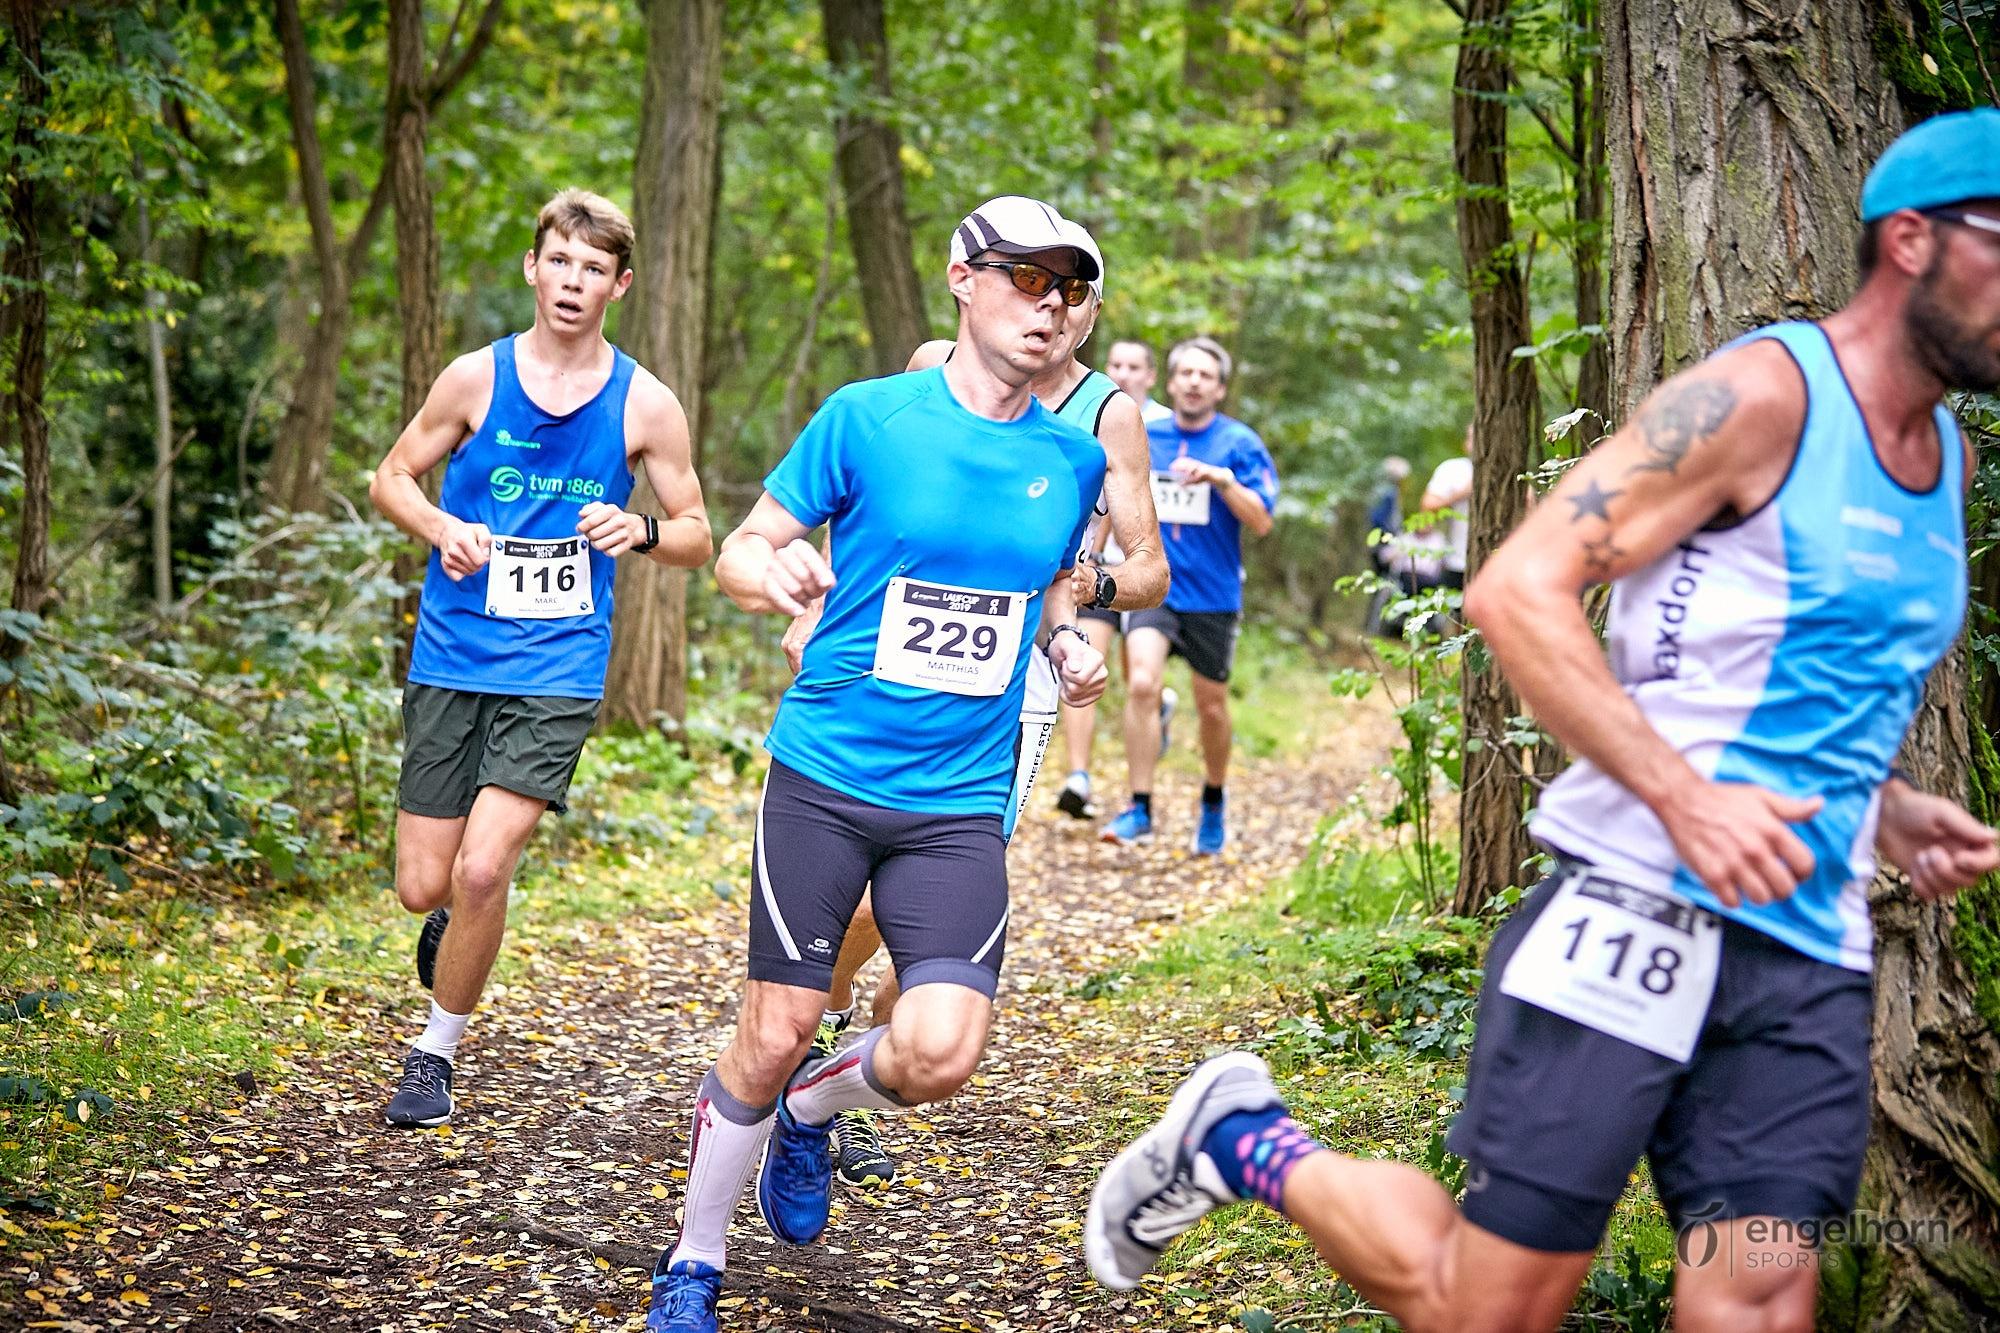 39. Maxdorfer Gemüselauf - engelhorn sports on Laufcup 2019